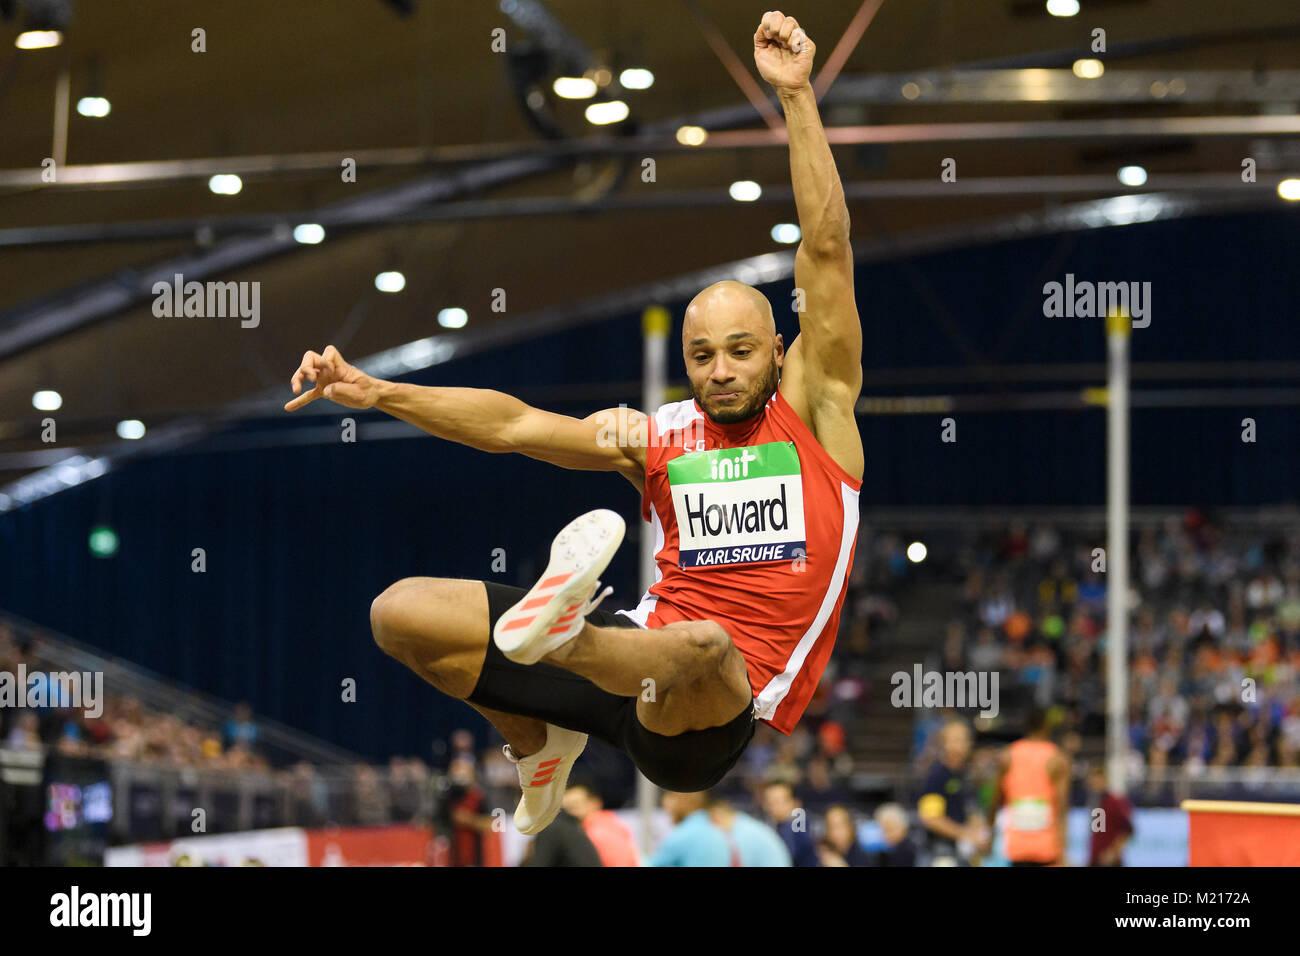 Karlsruhe, Deutschland. 03rd Feb, 2018. Weitsprung Maenner: Julian Howard (GER). GES/ Leichtathletik/ Indoor Meeting - Stock Image